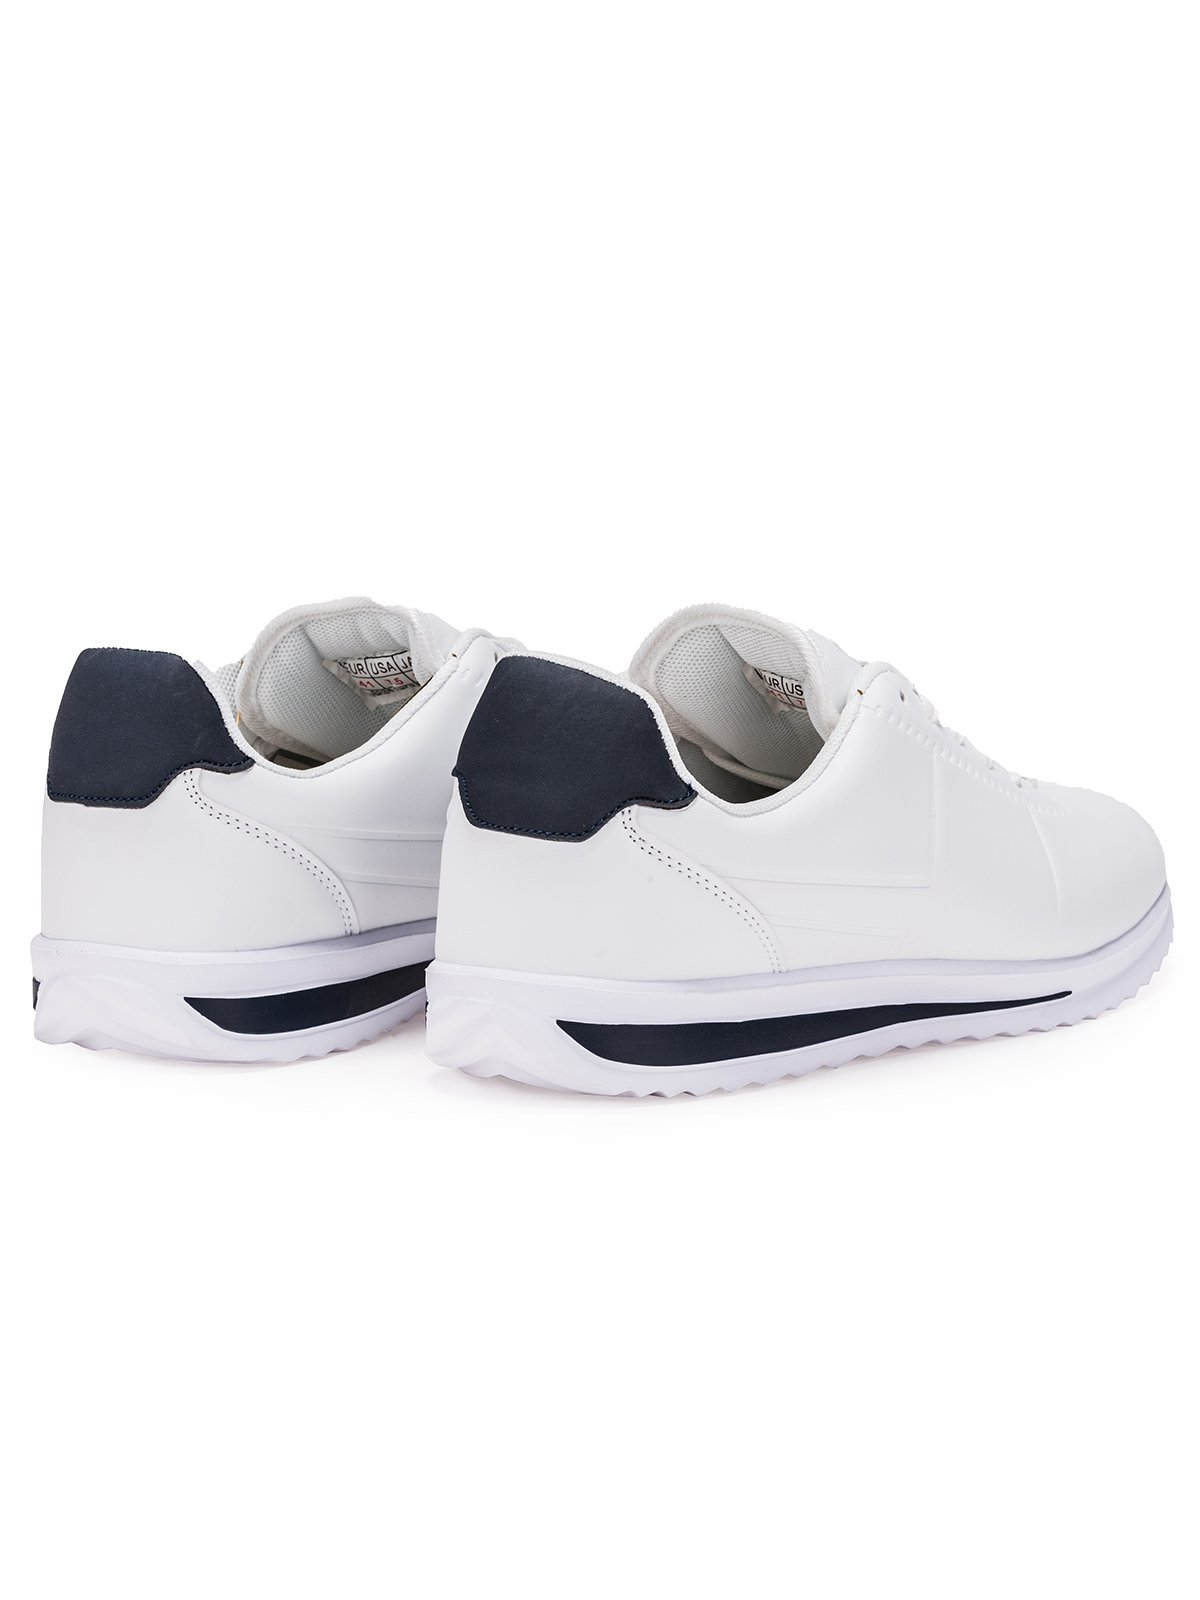 BUTY MĘSKIE SPORTOWE SNEAKERSY T200 BIAŁE Ombre Sneakersy męskie białe w Ombre